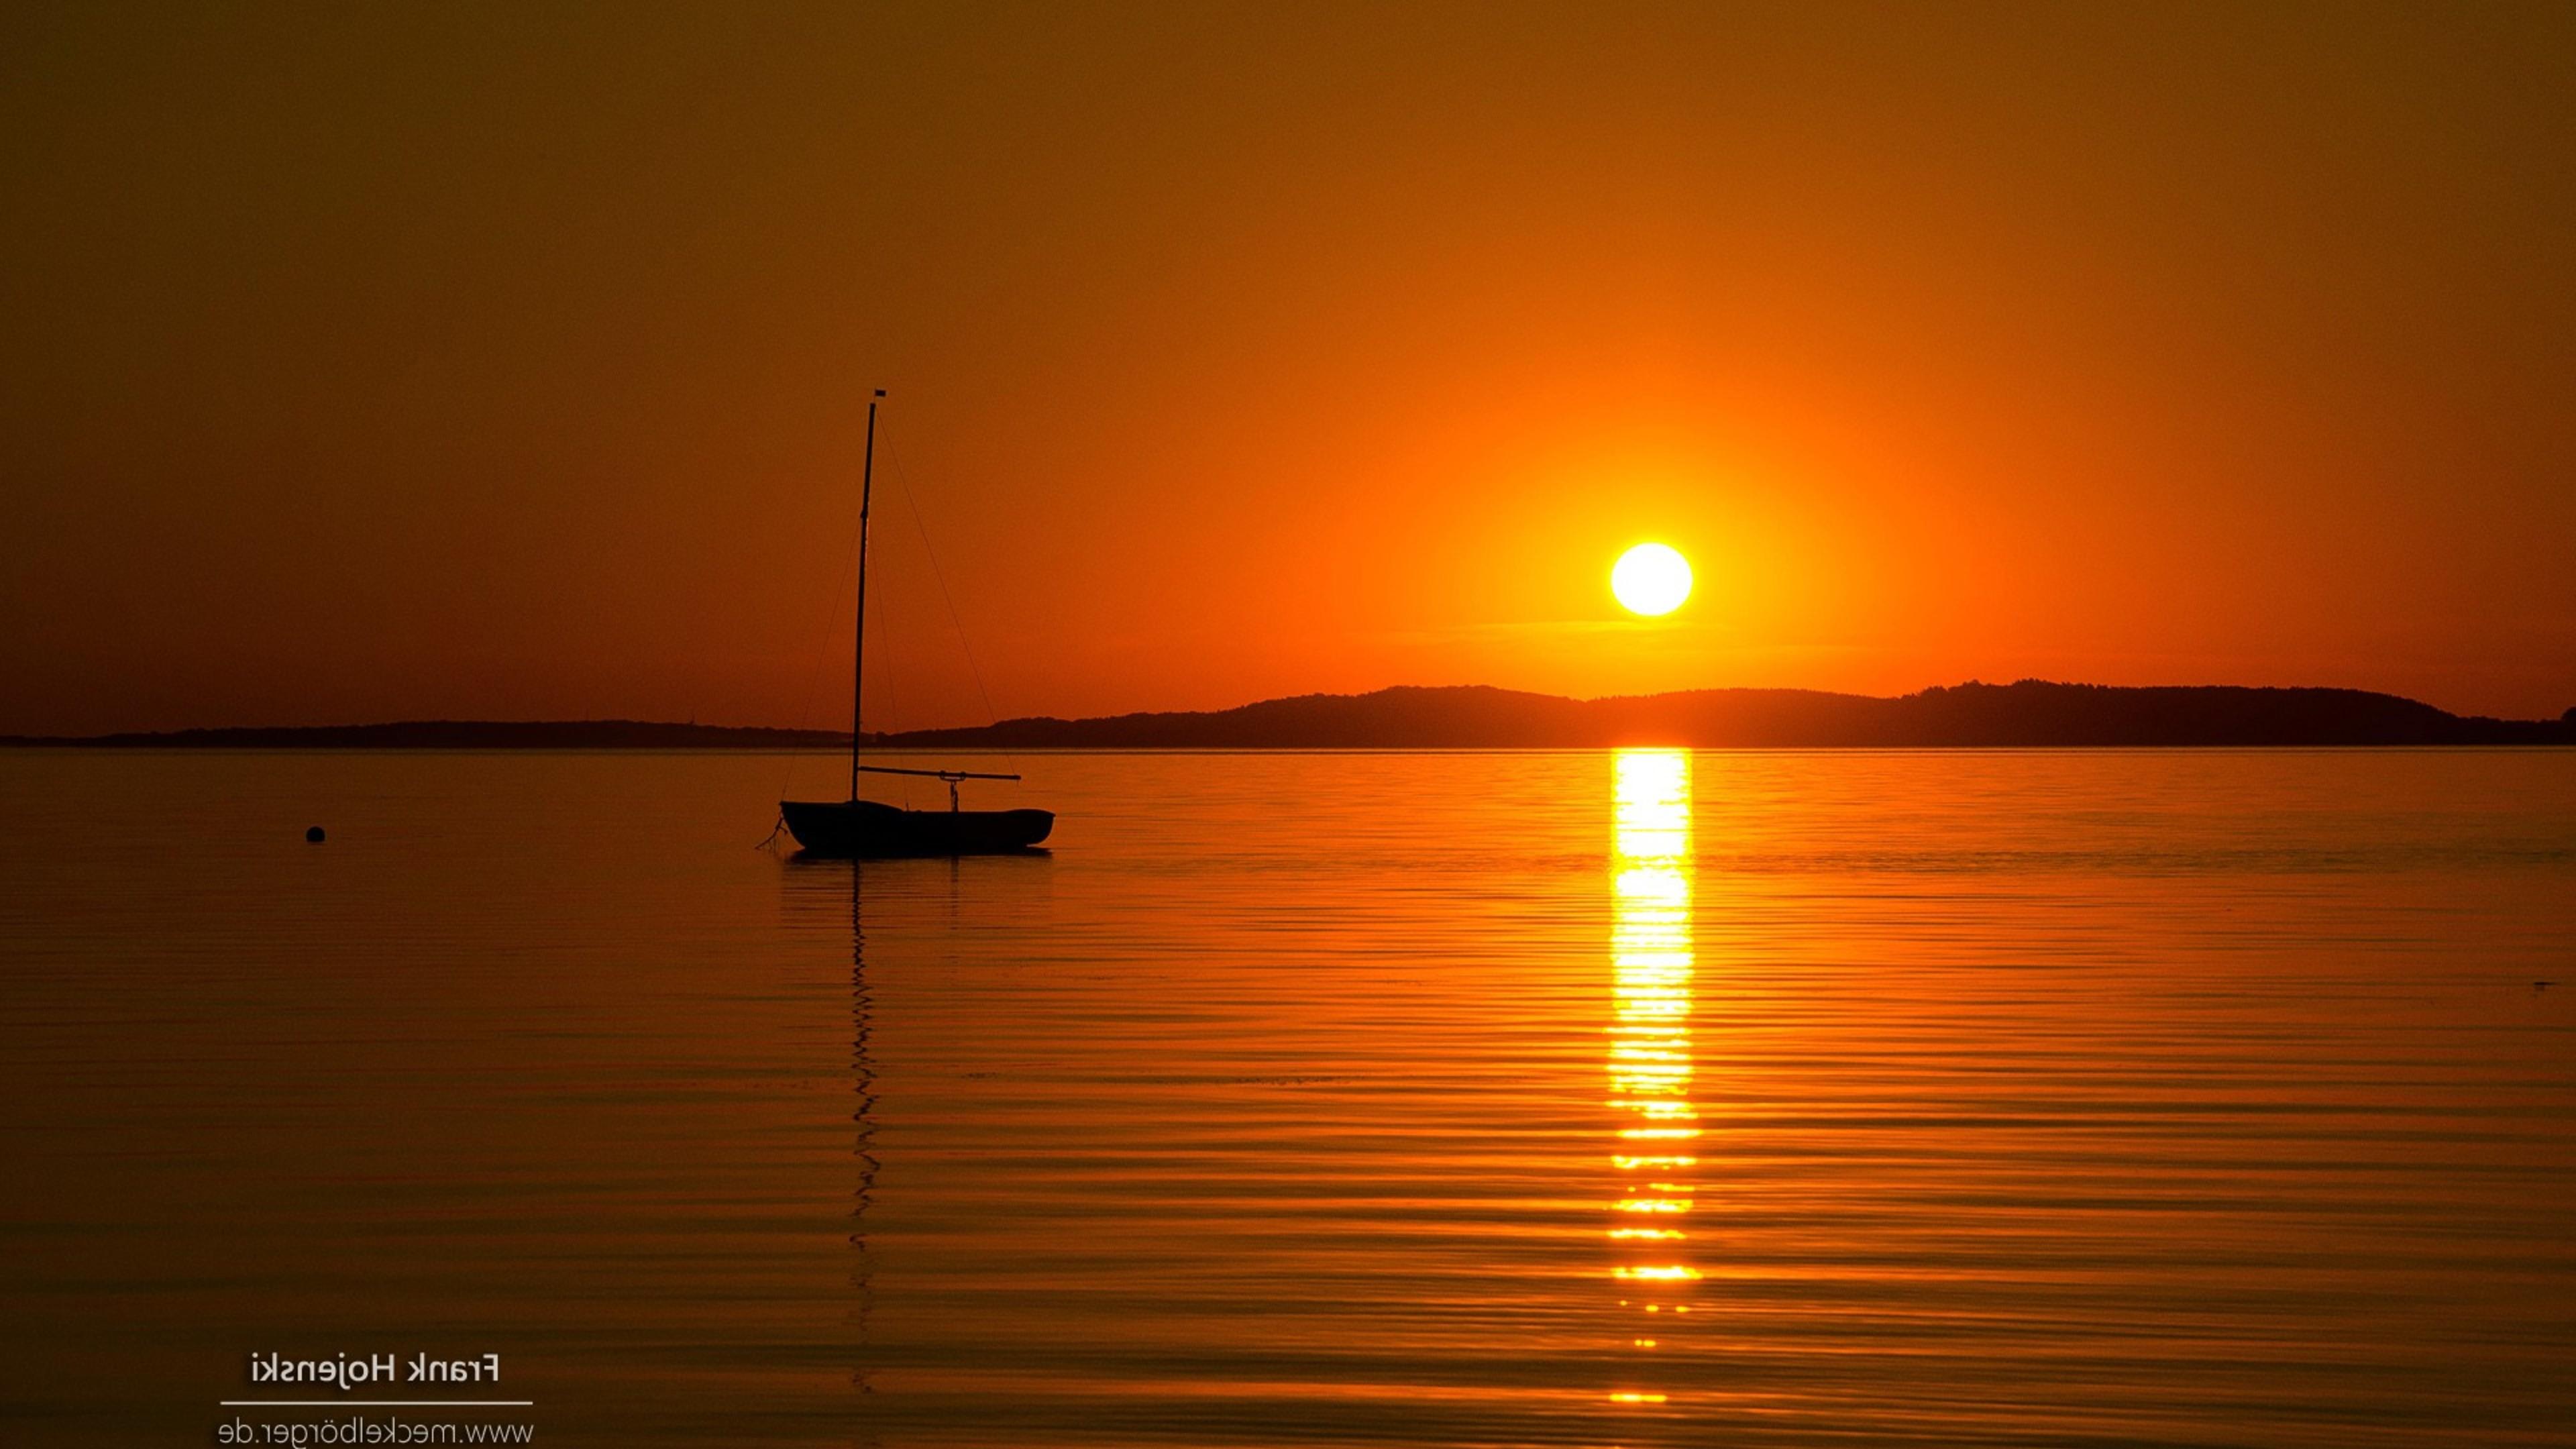 amazing sunset 1535930769 - Amazing Sunset - sunset wallpapers, nature wallpapers